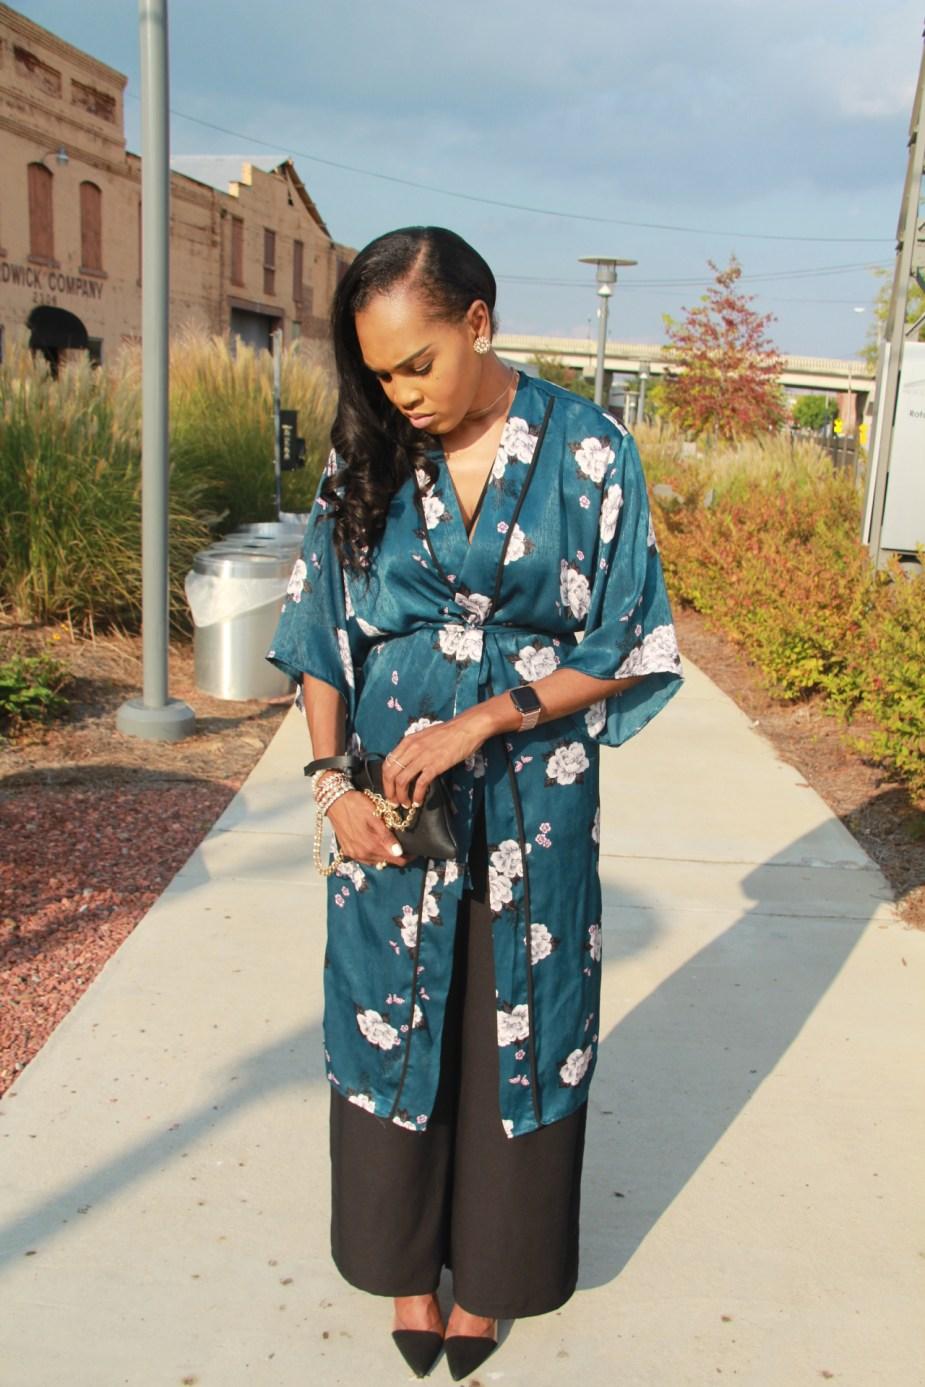 Style-files-Monteau-Green-floral-kimono-Boohoo-Wideleg-pants-zara-pvc-clear-black-pumps-forever21-lace-corset-bodysuit-ooohlalablog-15